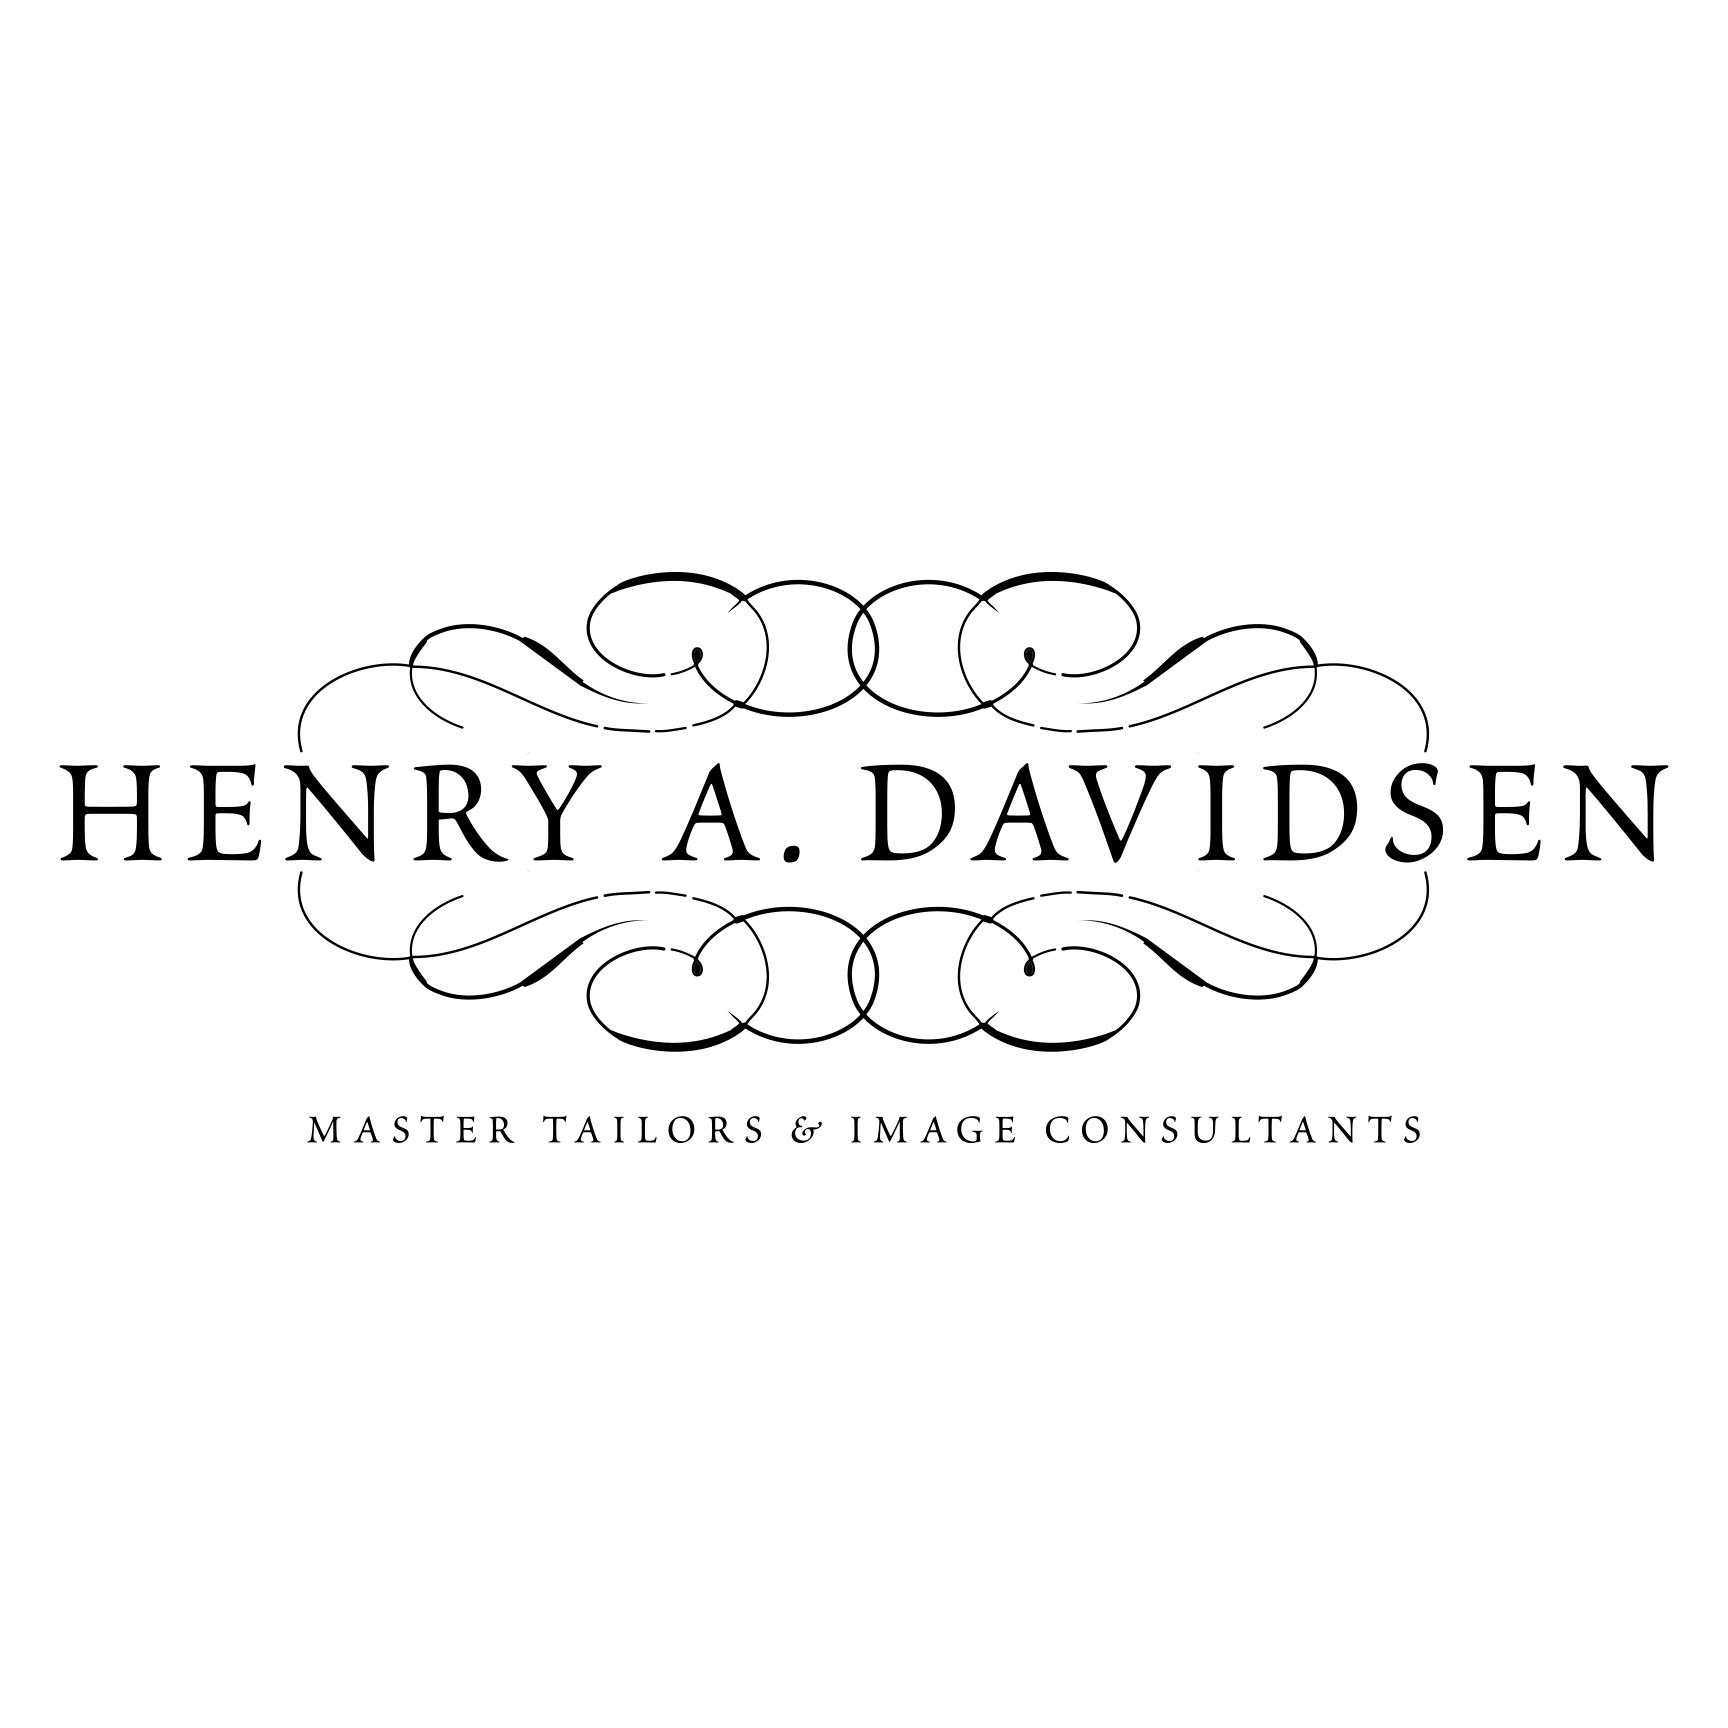 HenryADavidsenTailor_logo.jpg